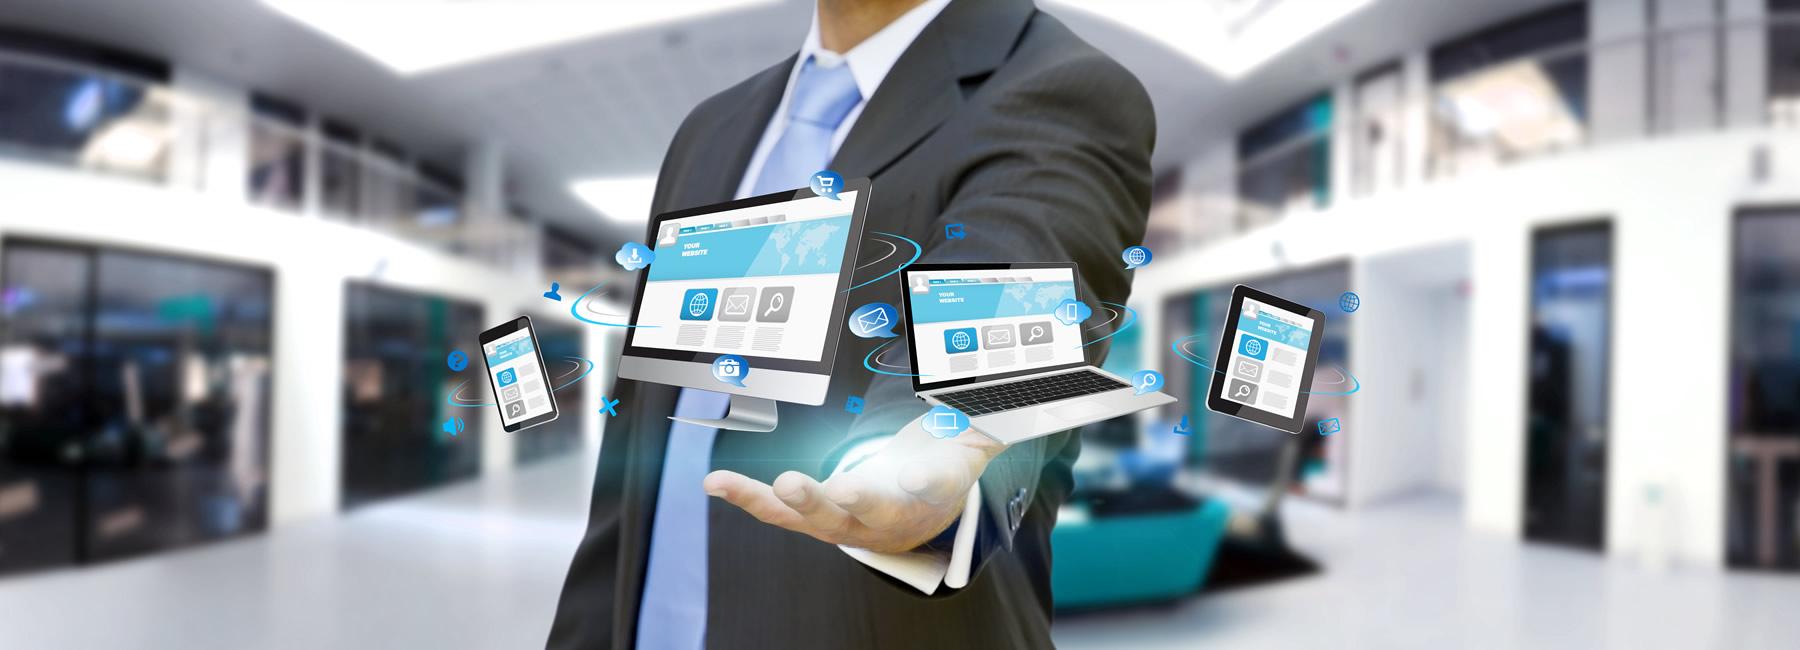 datascoring servicios gestion saas credito cartera